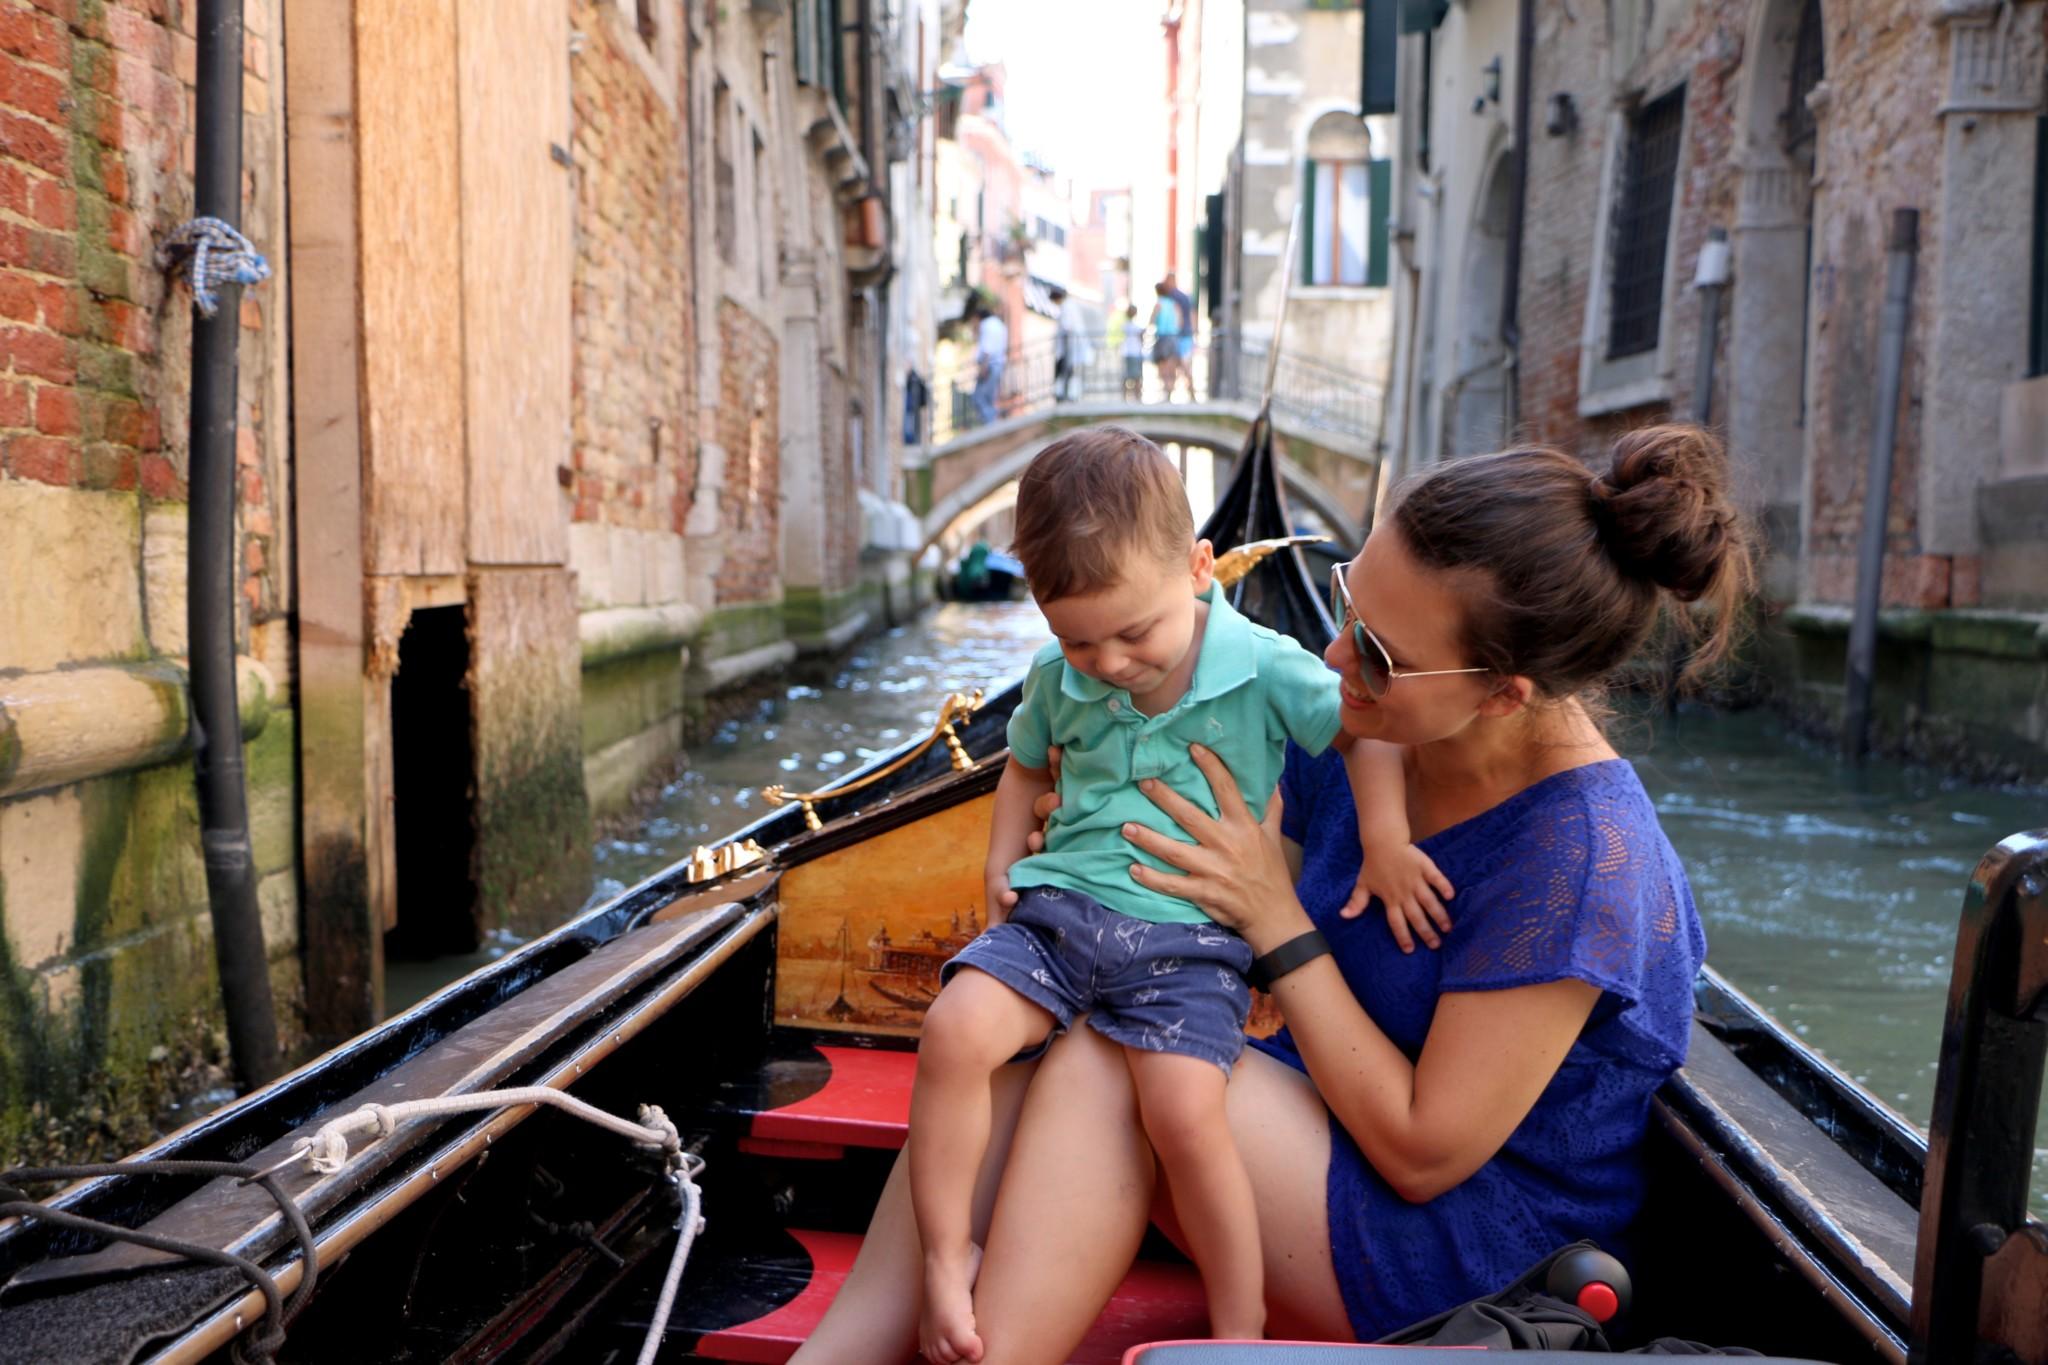 A Gondola Ride in Venice, Italy